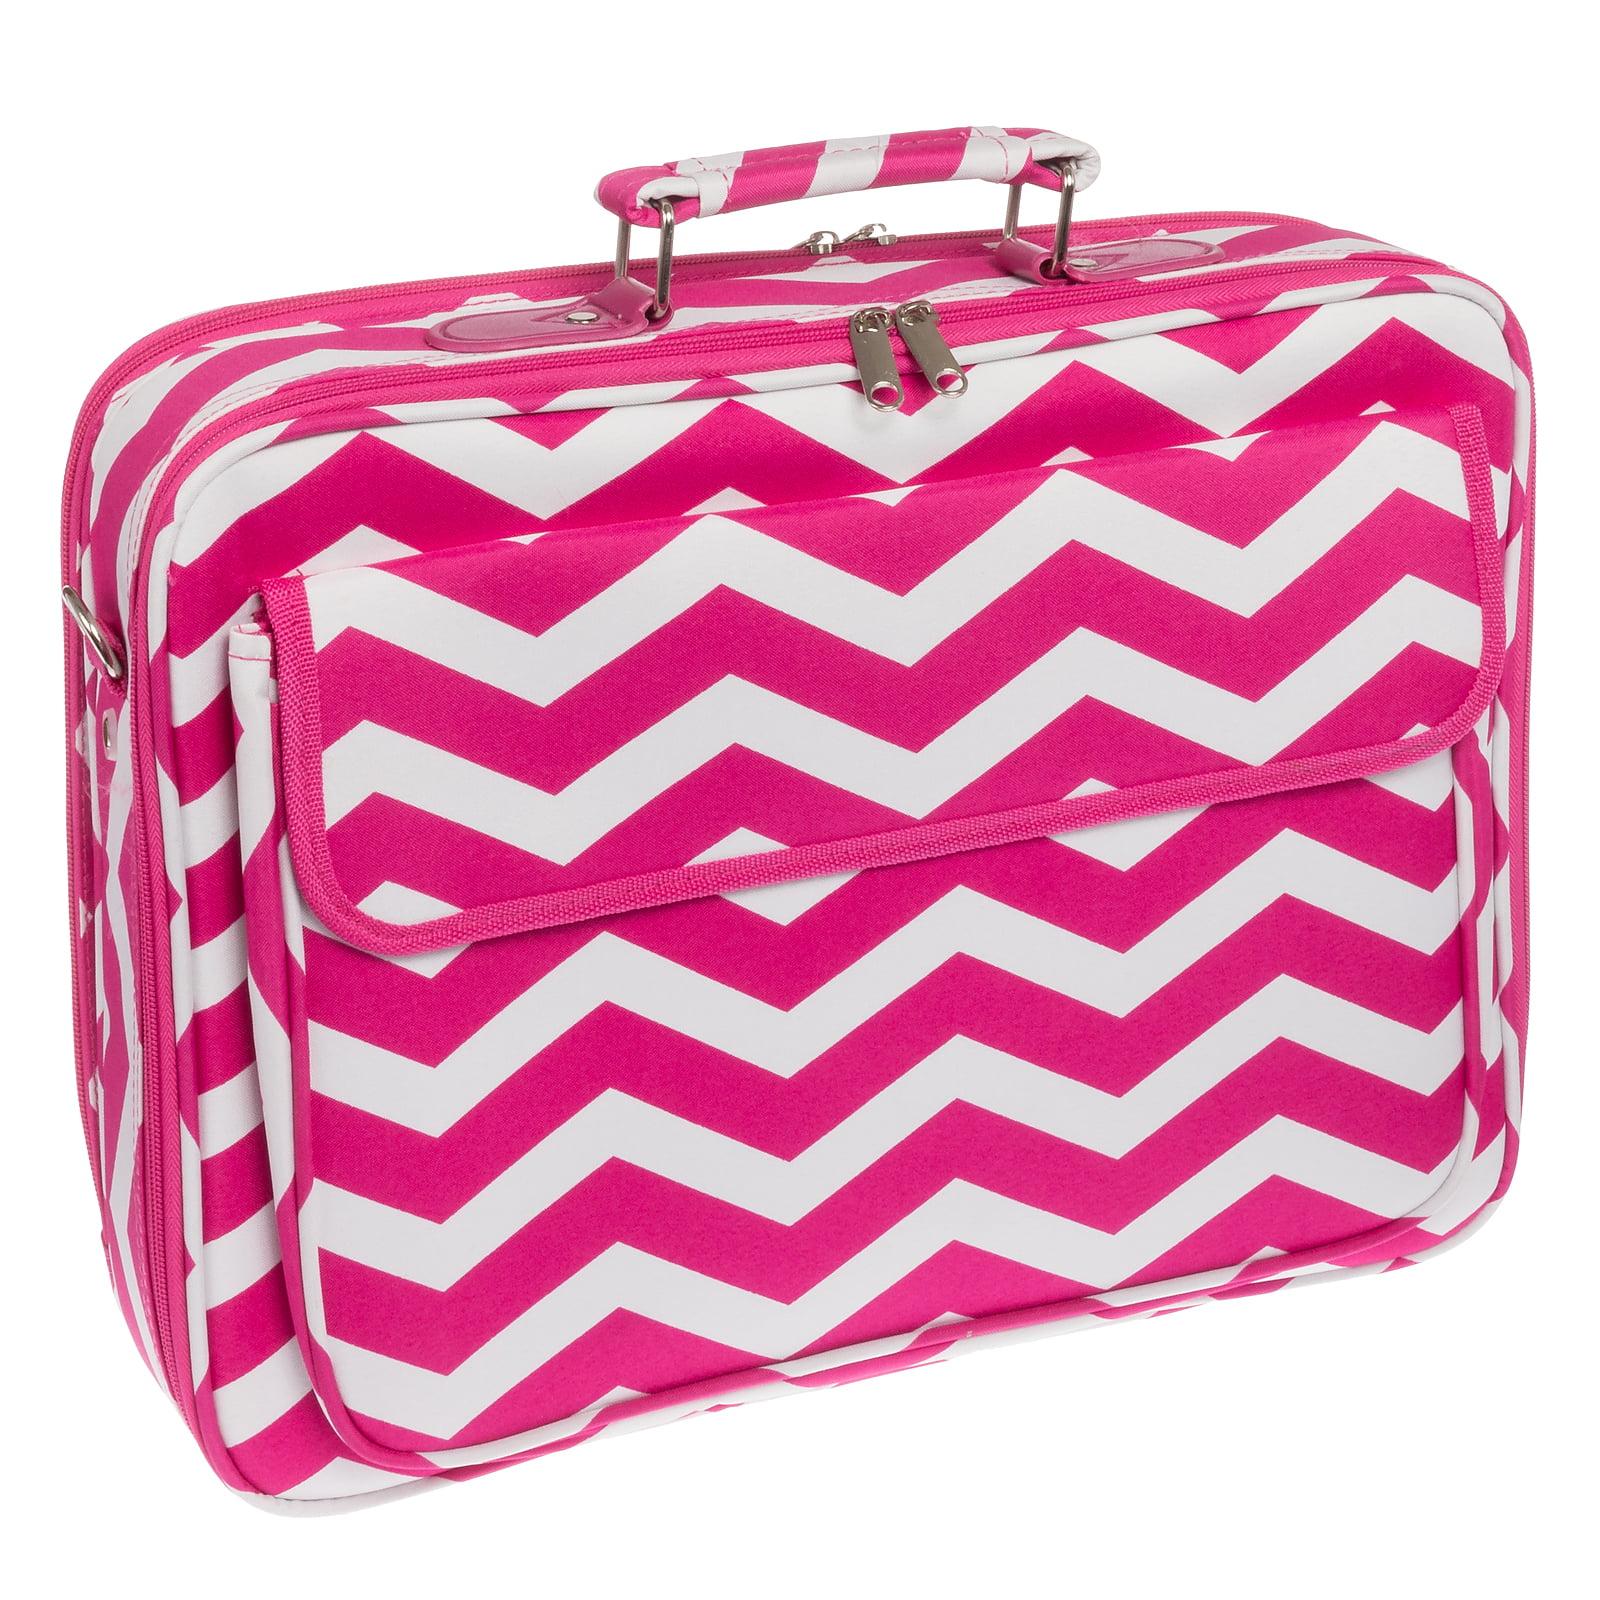 "Pink & White Chevron Stripe 17"" Laptop Case Cover Protector Messenger Carry Bag"